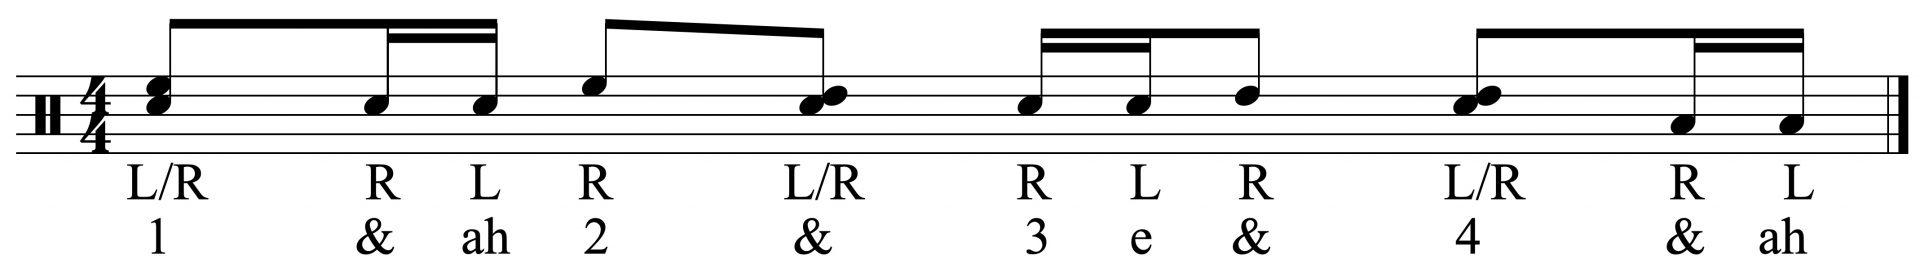 The basic rhythm orchestrated